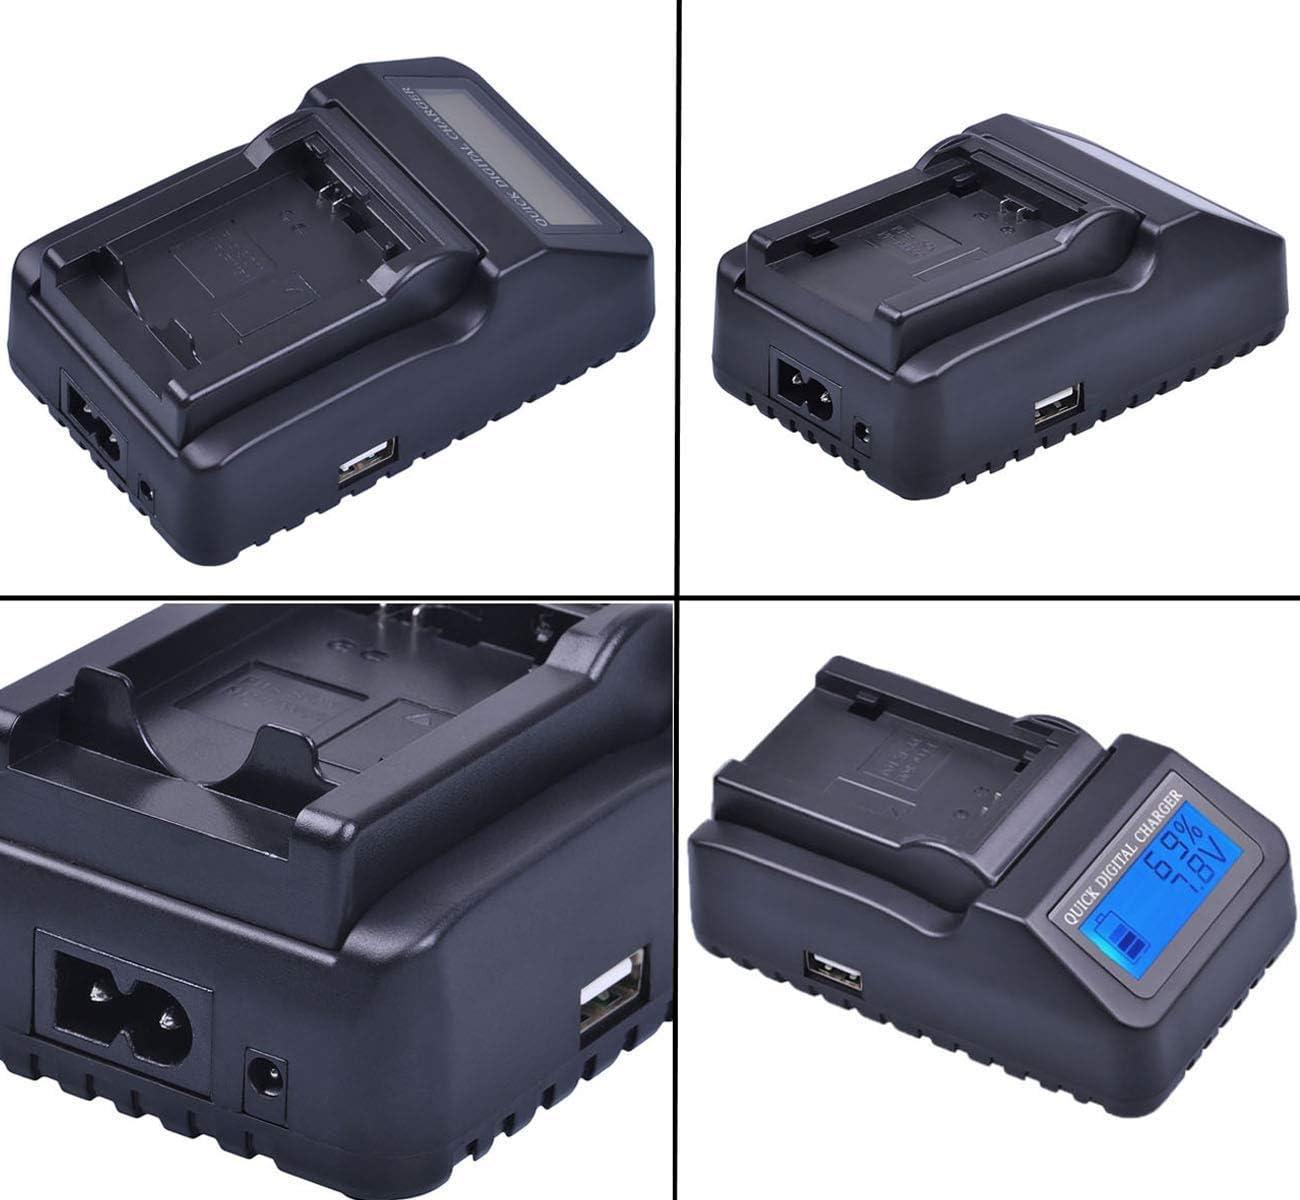 VDR-M75PP VDR-M95PP Camcorder LCD Quick Battery Charger for Panasonic VDR-M70PP